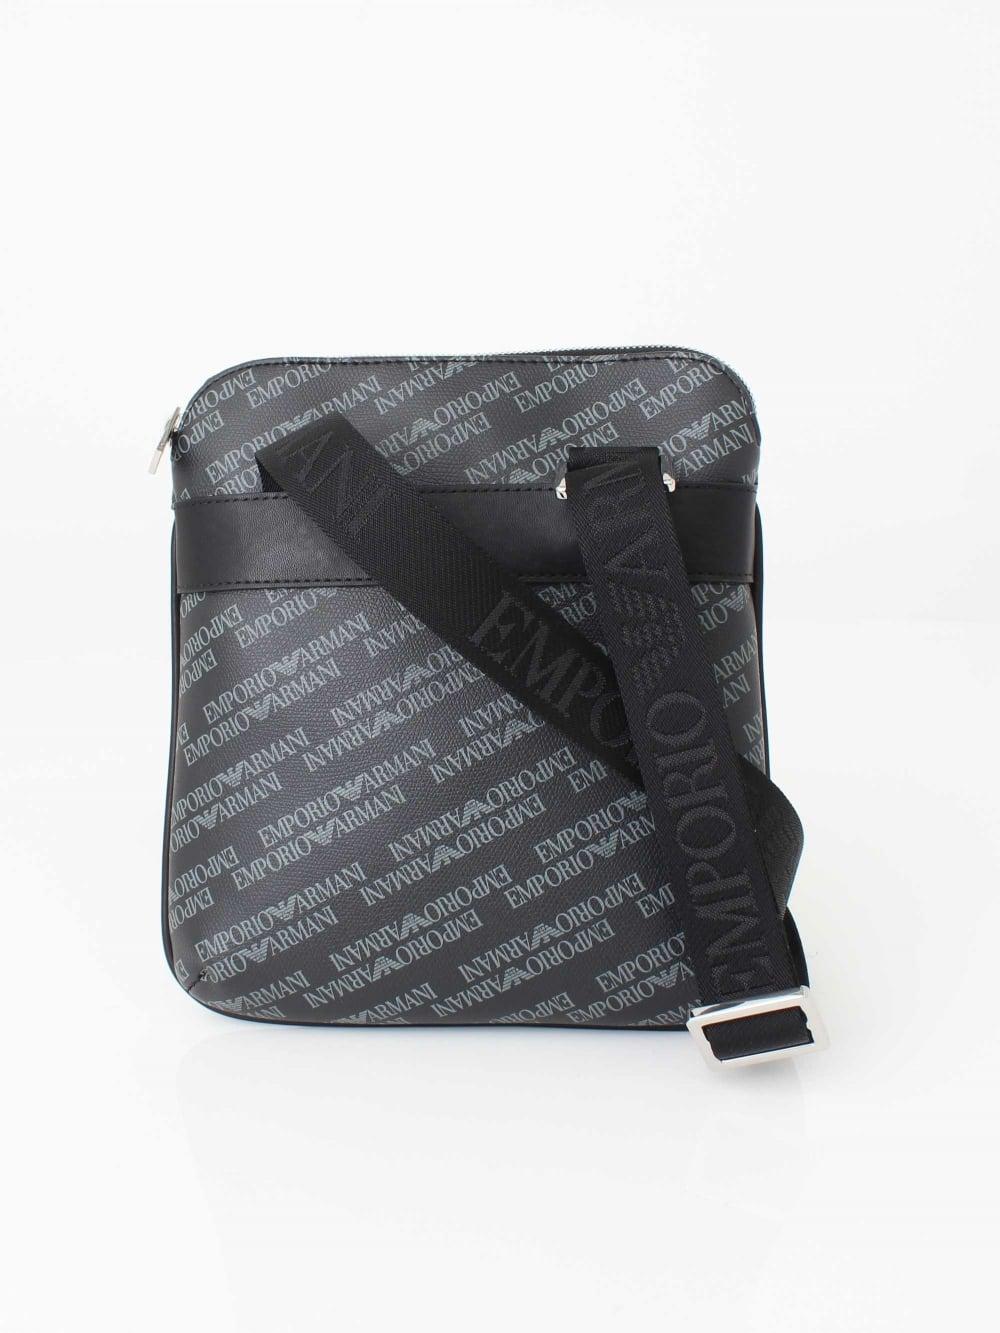 Emporio Armani Messenger Bag in Black  a2b54d6e63986